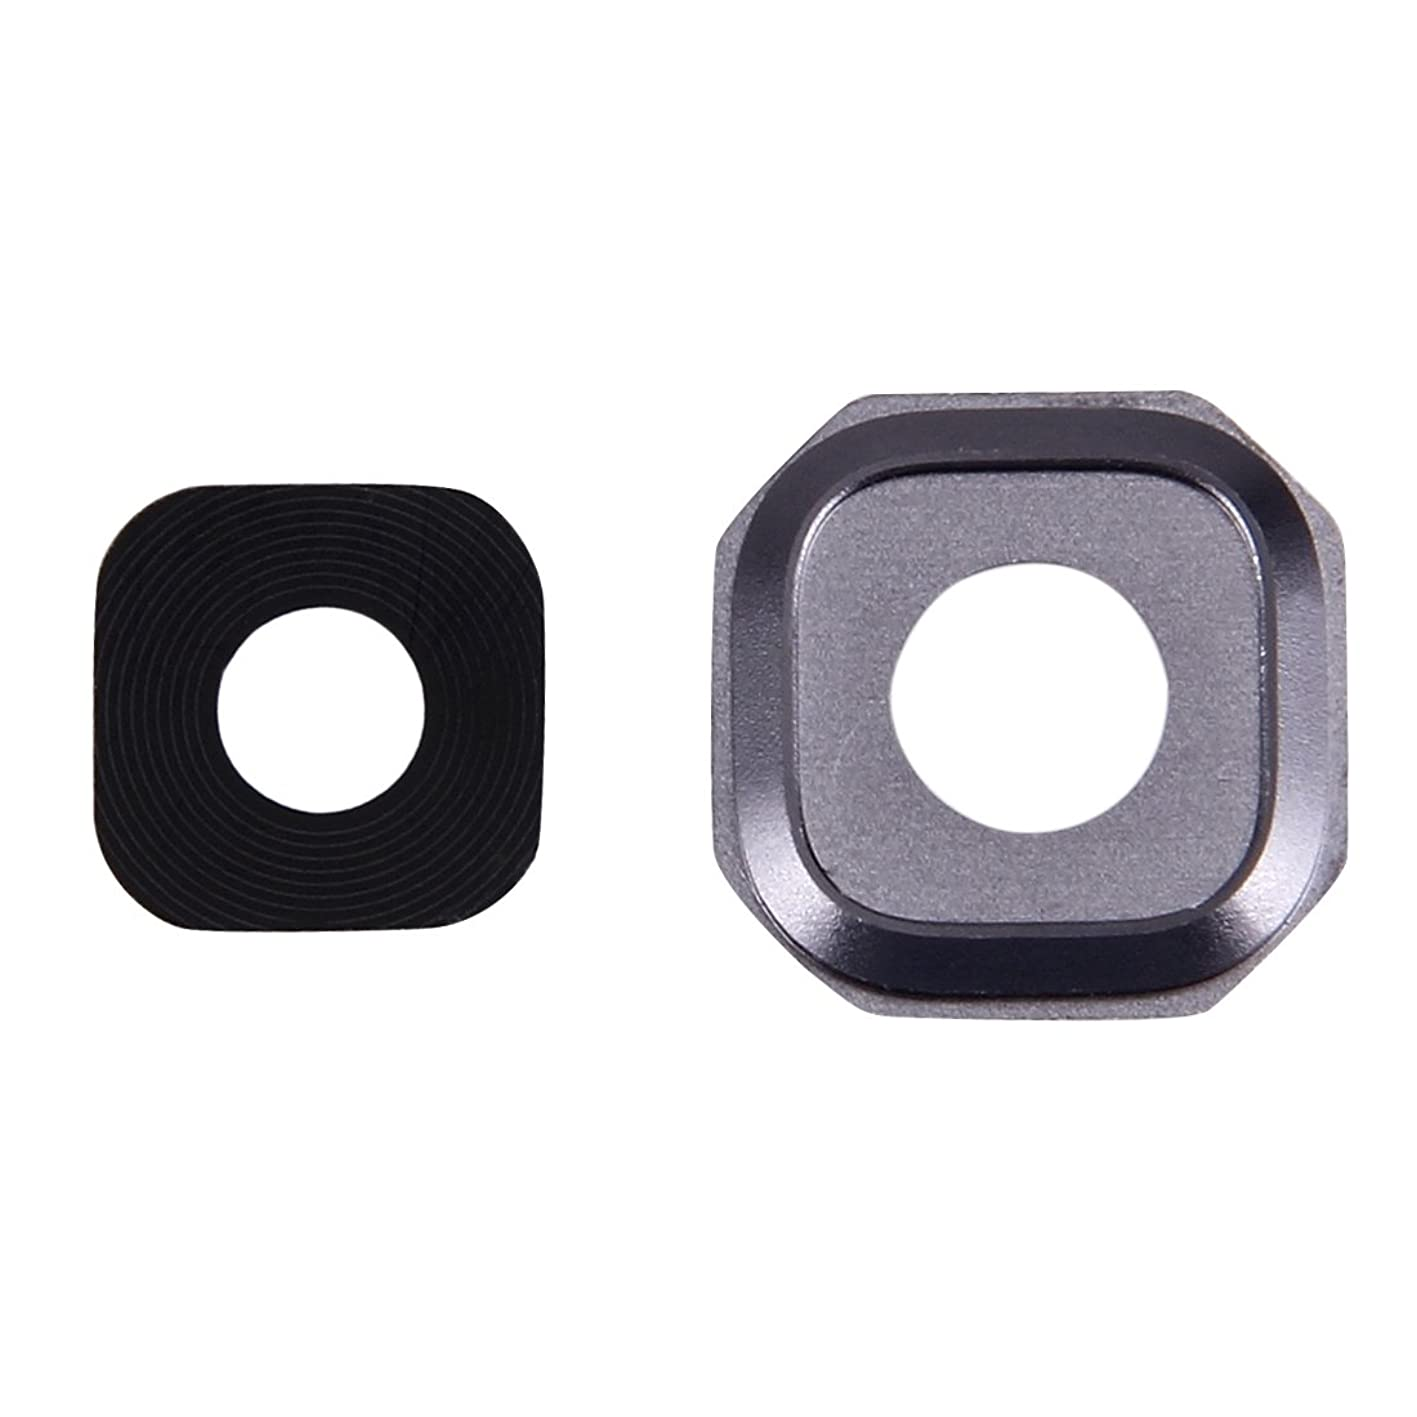 HONGYU Smartphone Spare Parts 10 PCS Camera Lens Covers for Galaxy A7 (2016) / A710(Pink) Repair Parts (Color : Grey) qvwhlxrapcb943